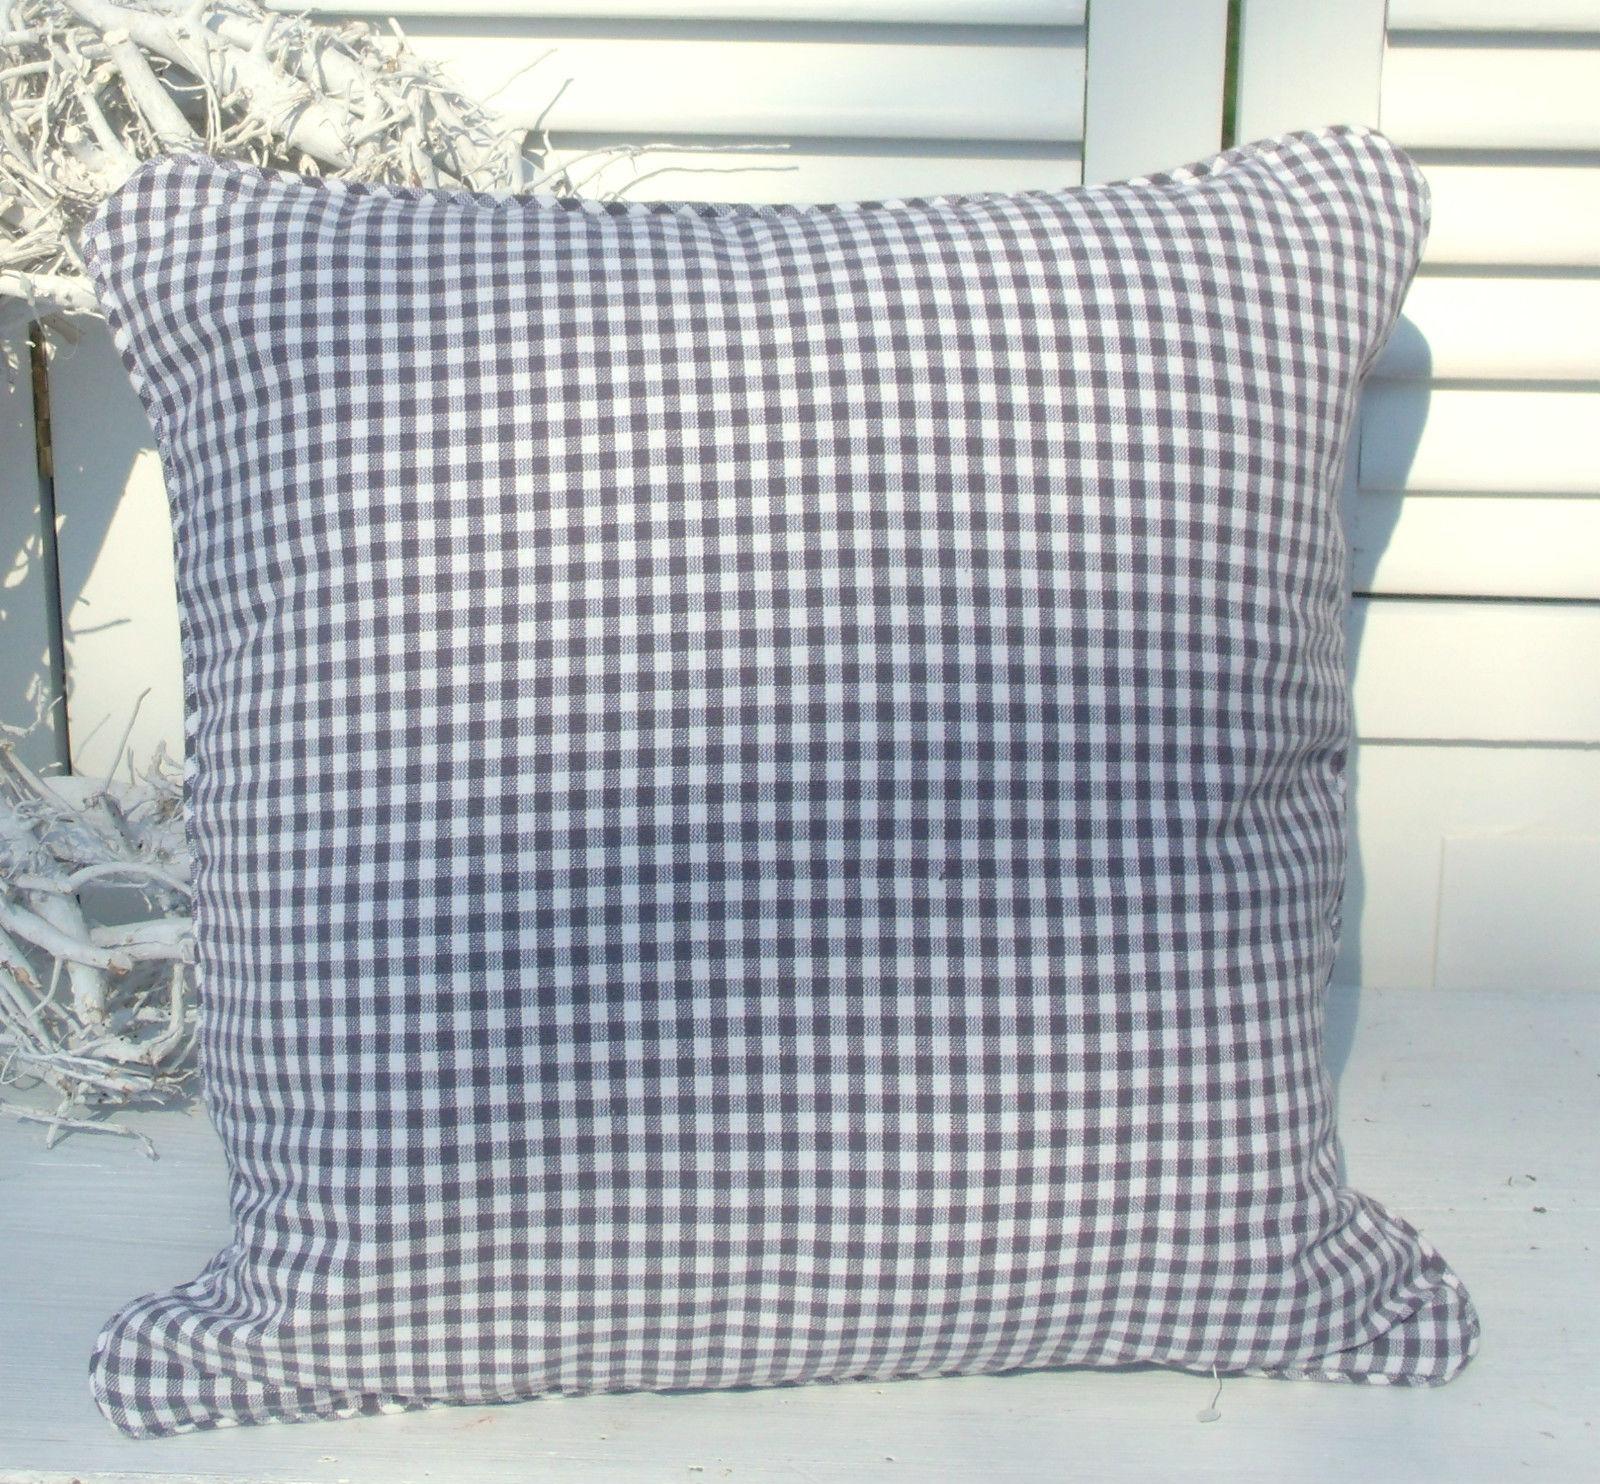 kissenbezug carla grau 45x45 cm vichy karo kissenbez ge. Black Bedroom Furniture Sets. Home Design Ideas